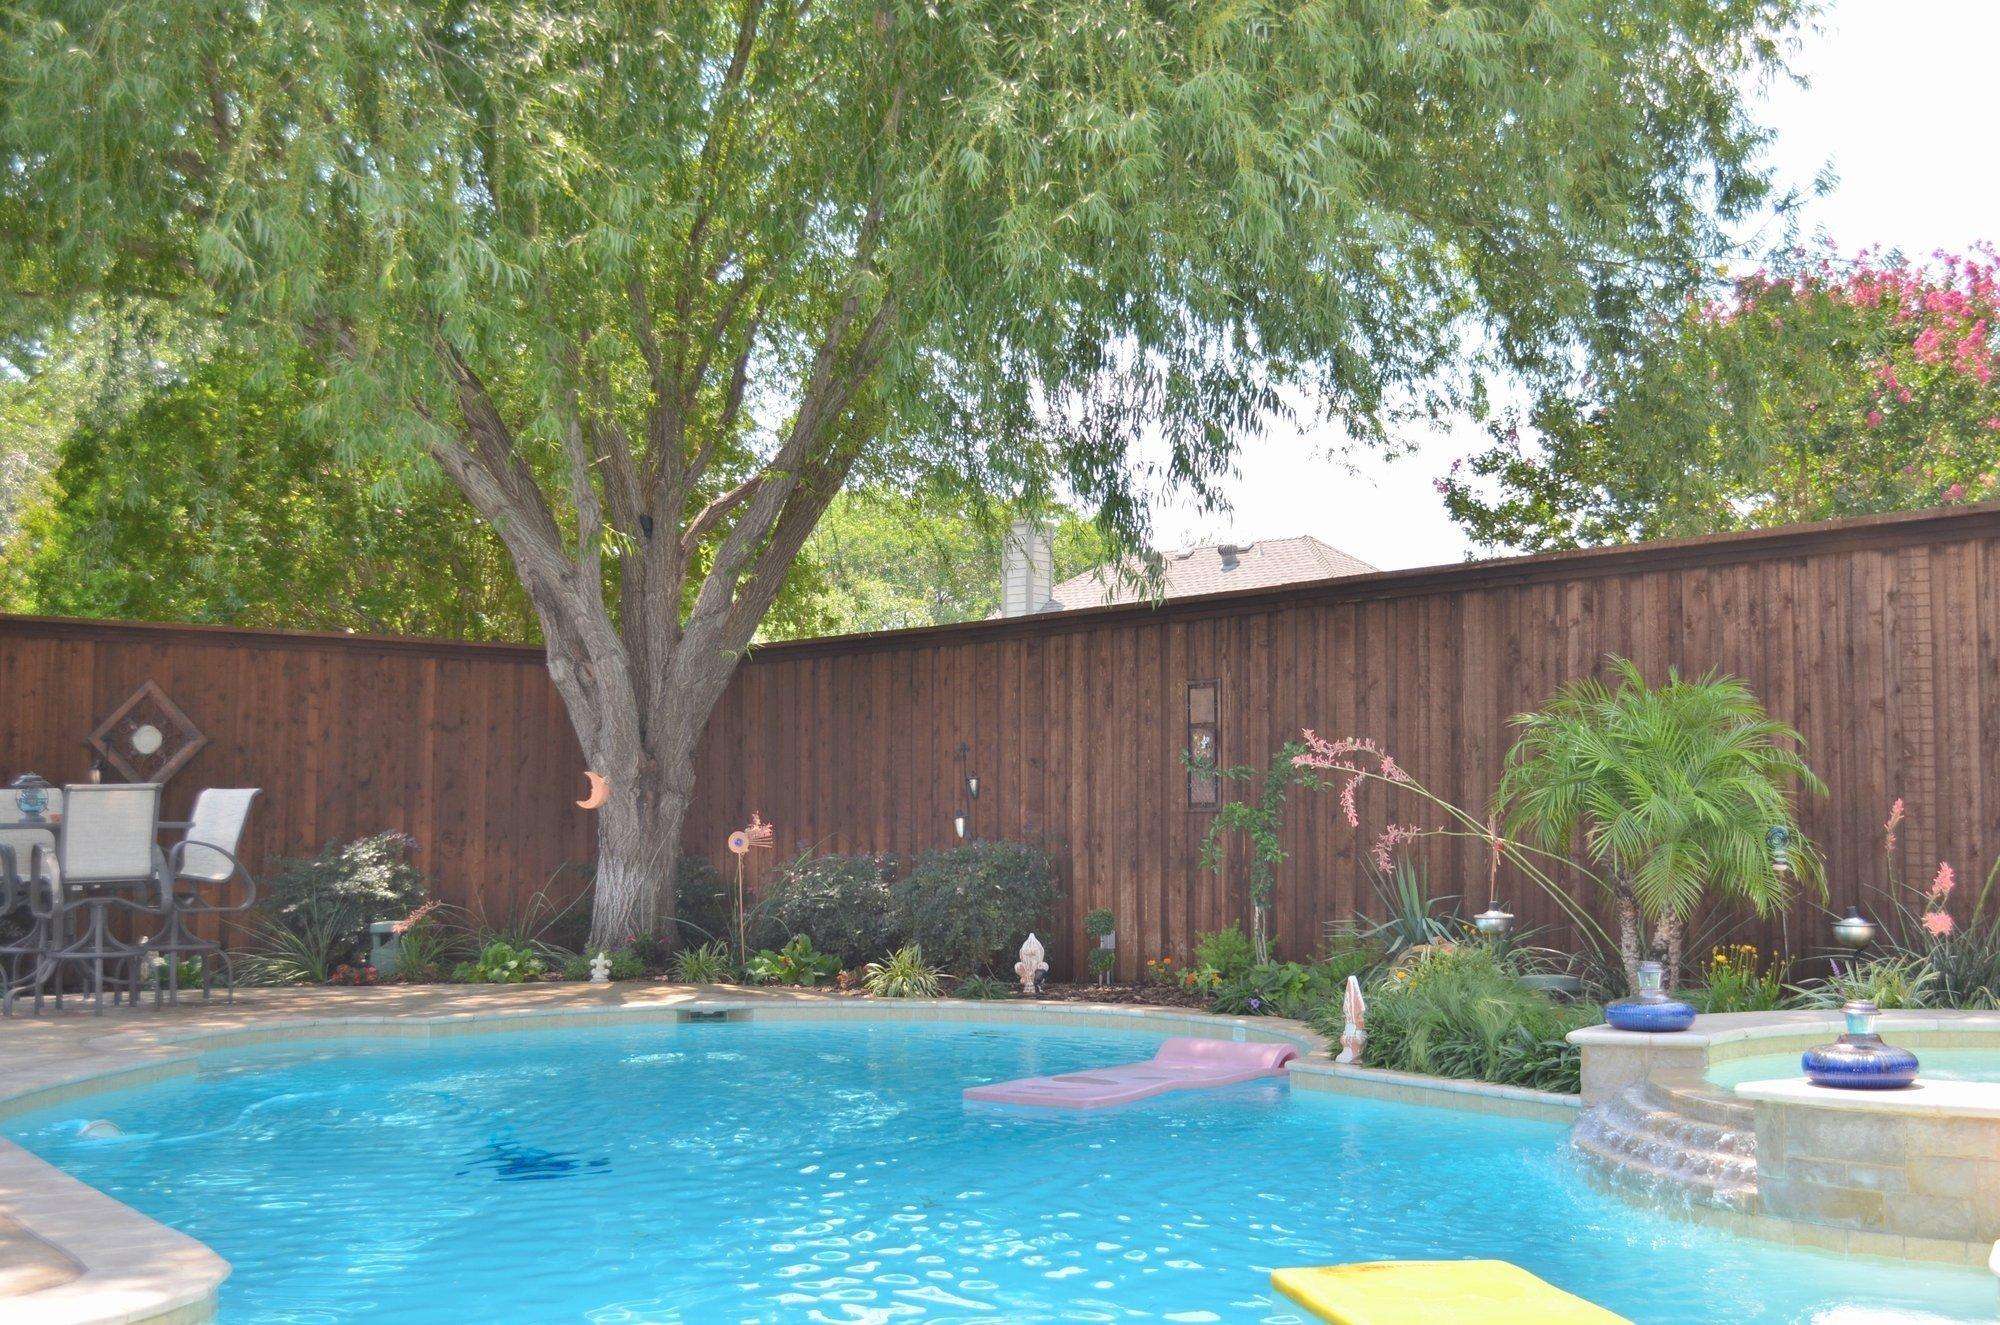 7 Kid-Friendly Pool Fence Design